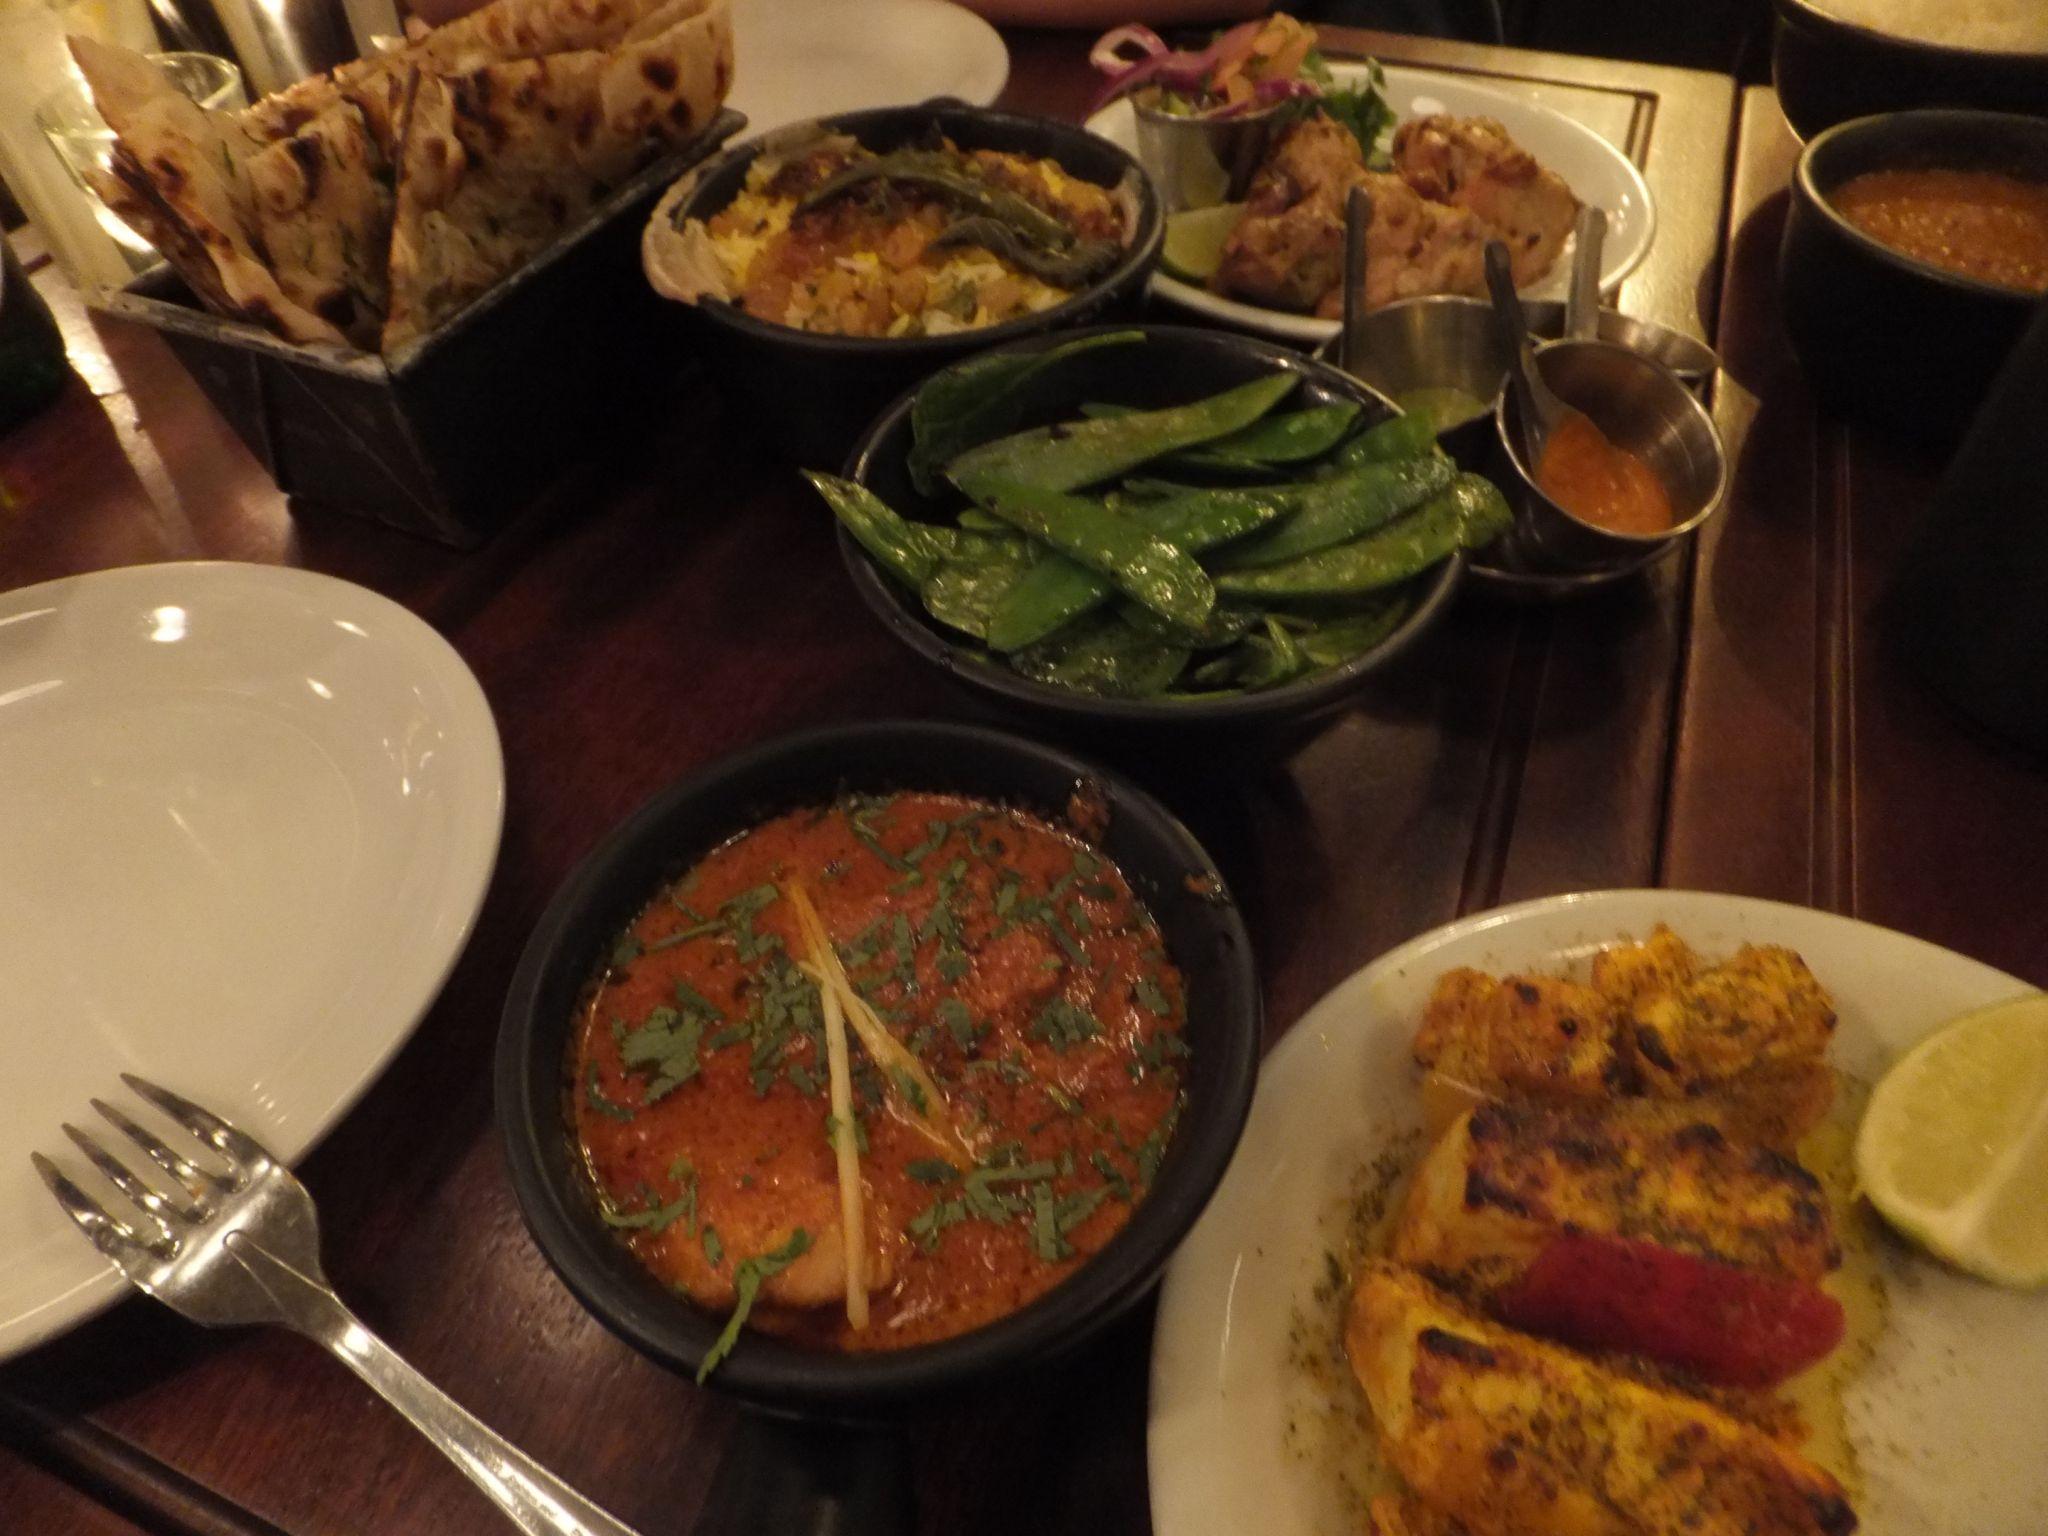 Meal at Dishoom